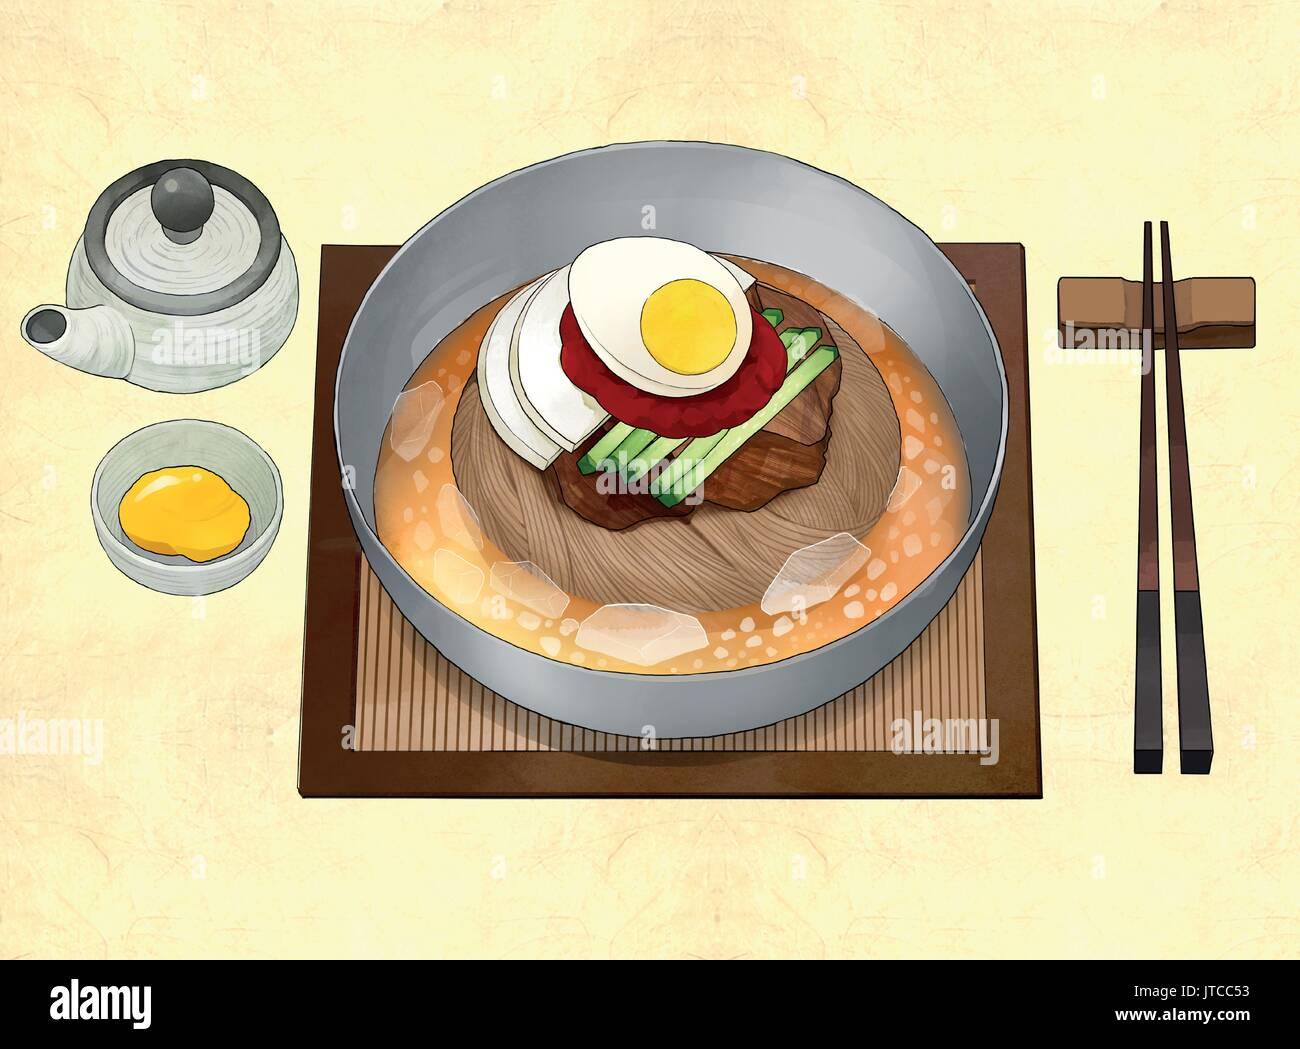 Korean food illustration - Stock Image